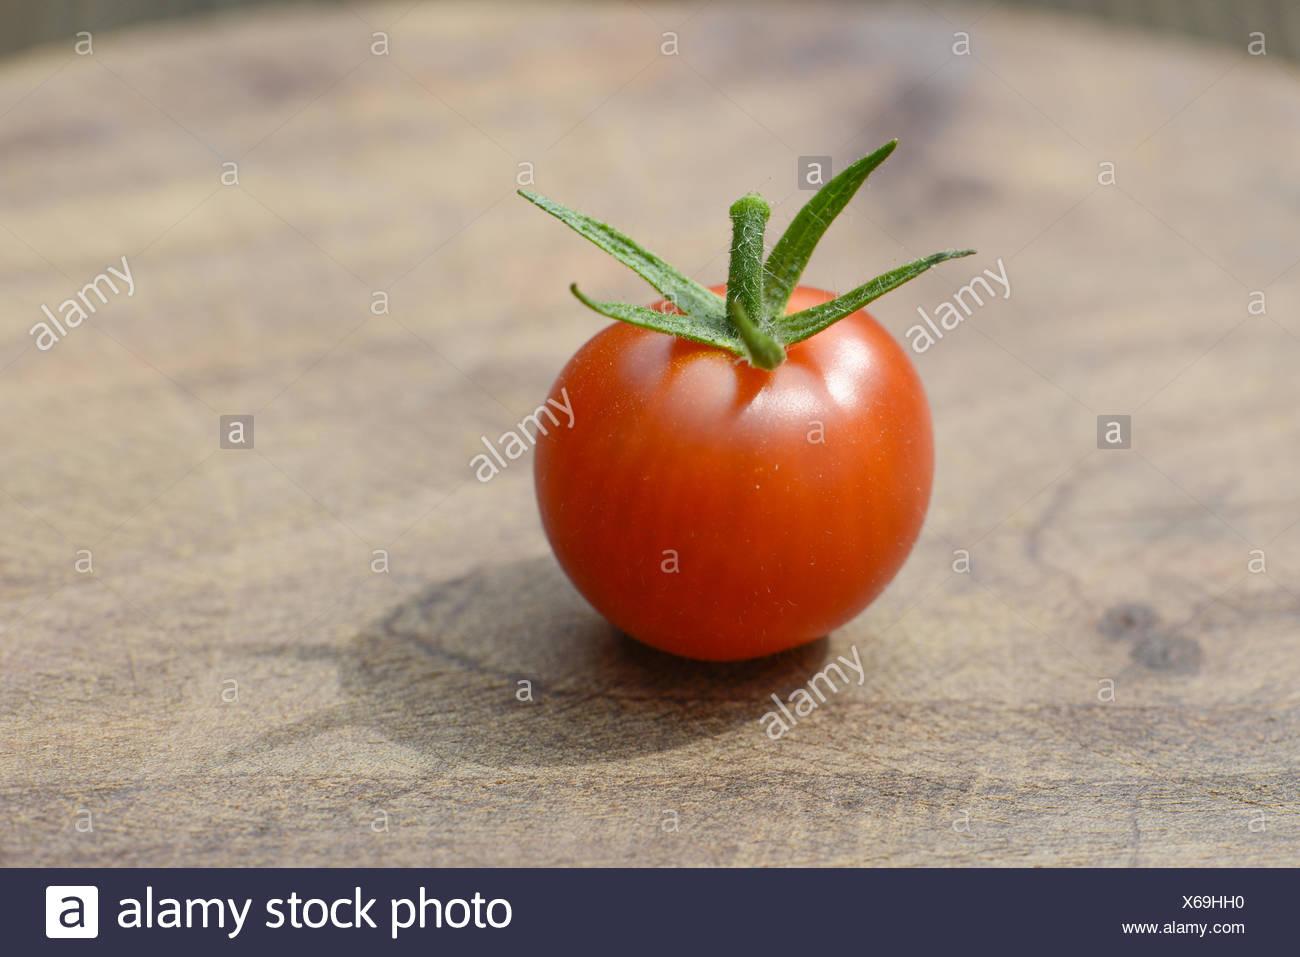 Red garden tomatoe, Austria - Stock Image